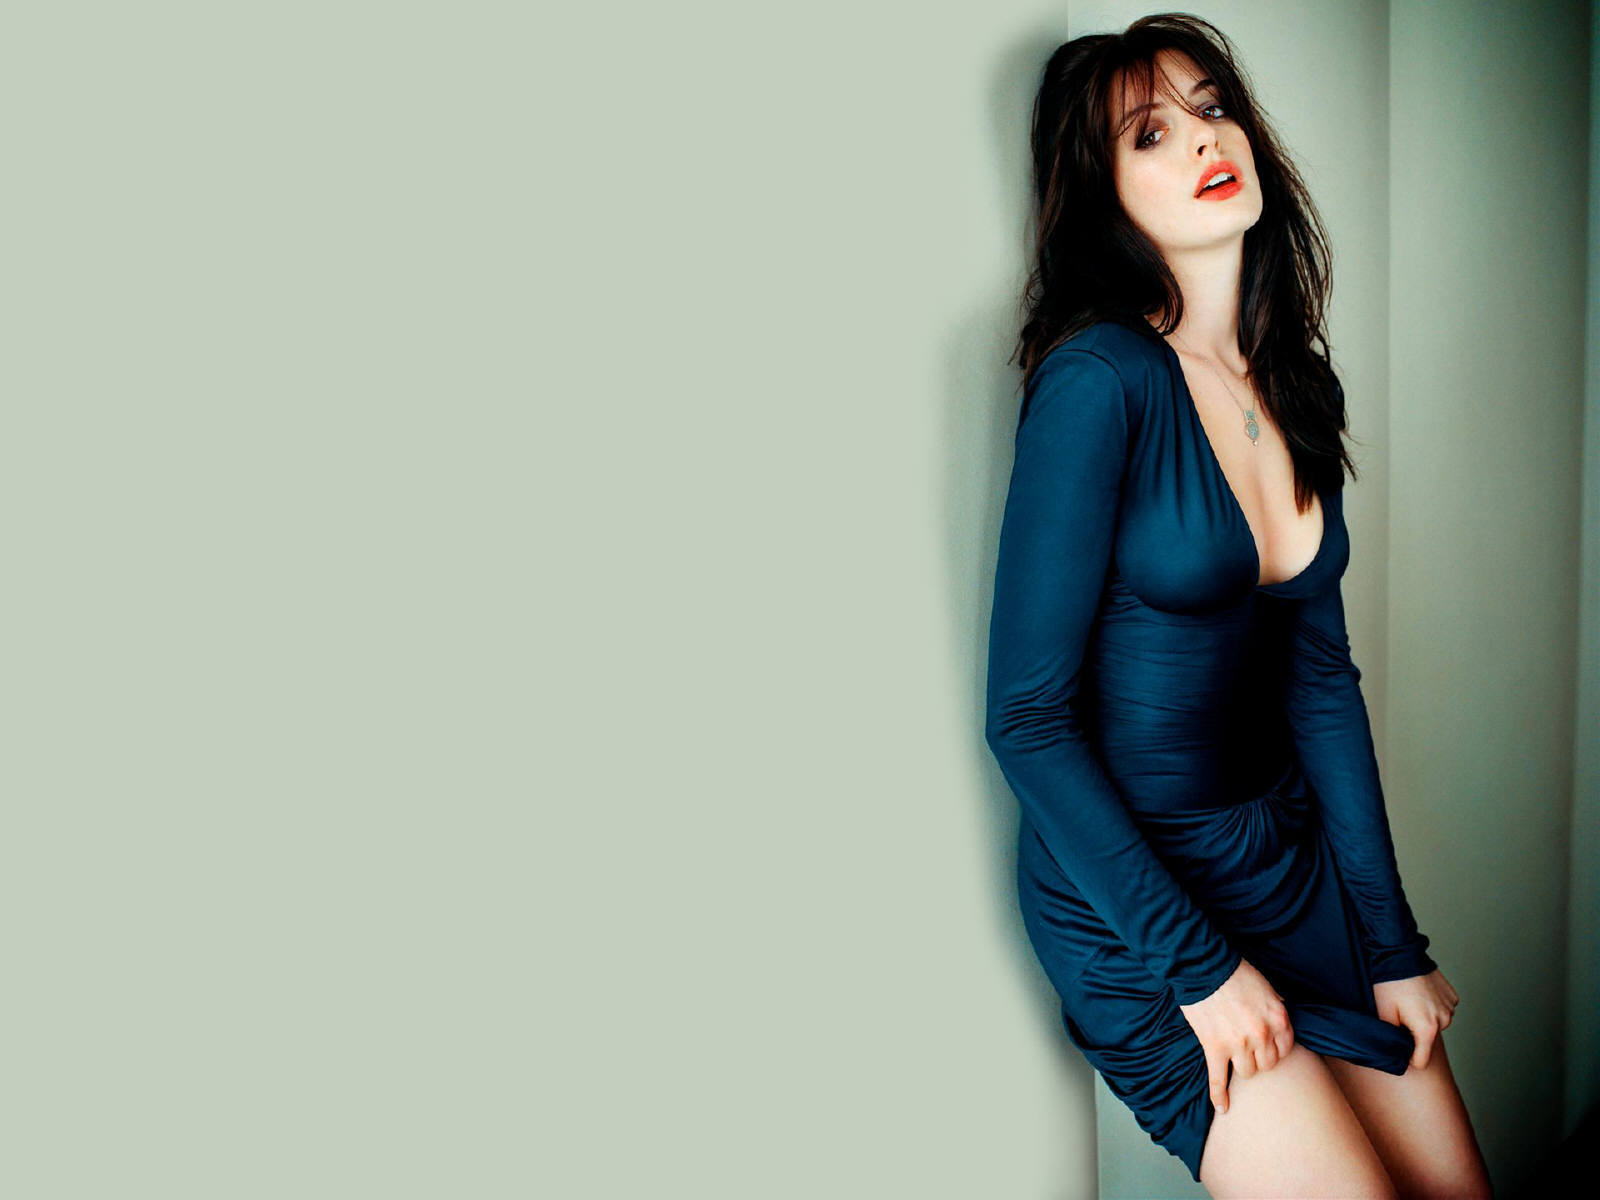 Anne Hathaway For Desktop Background